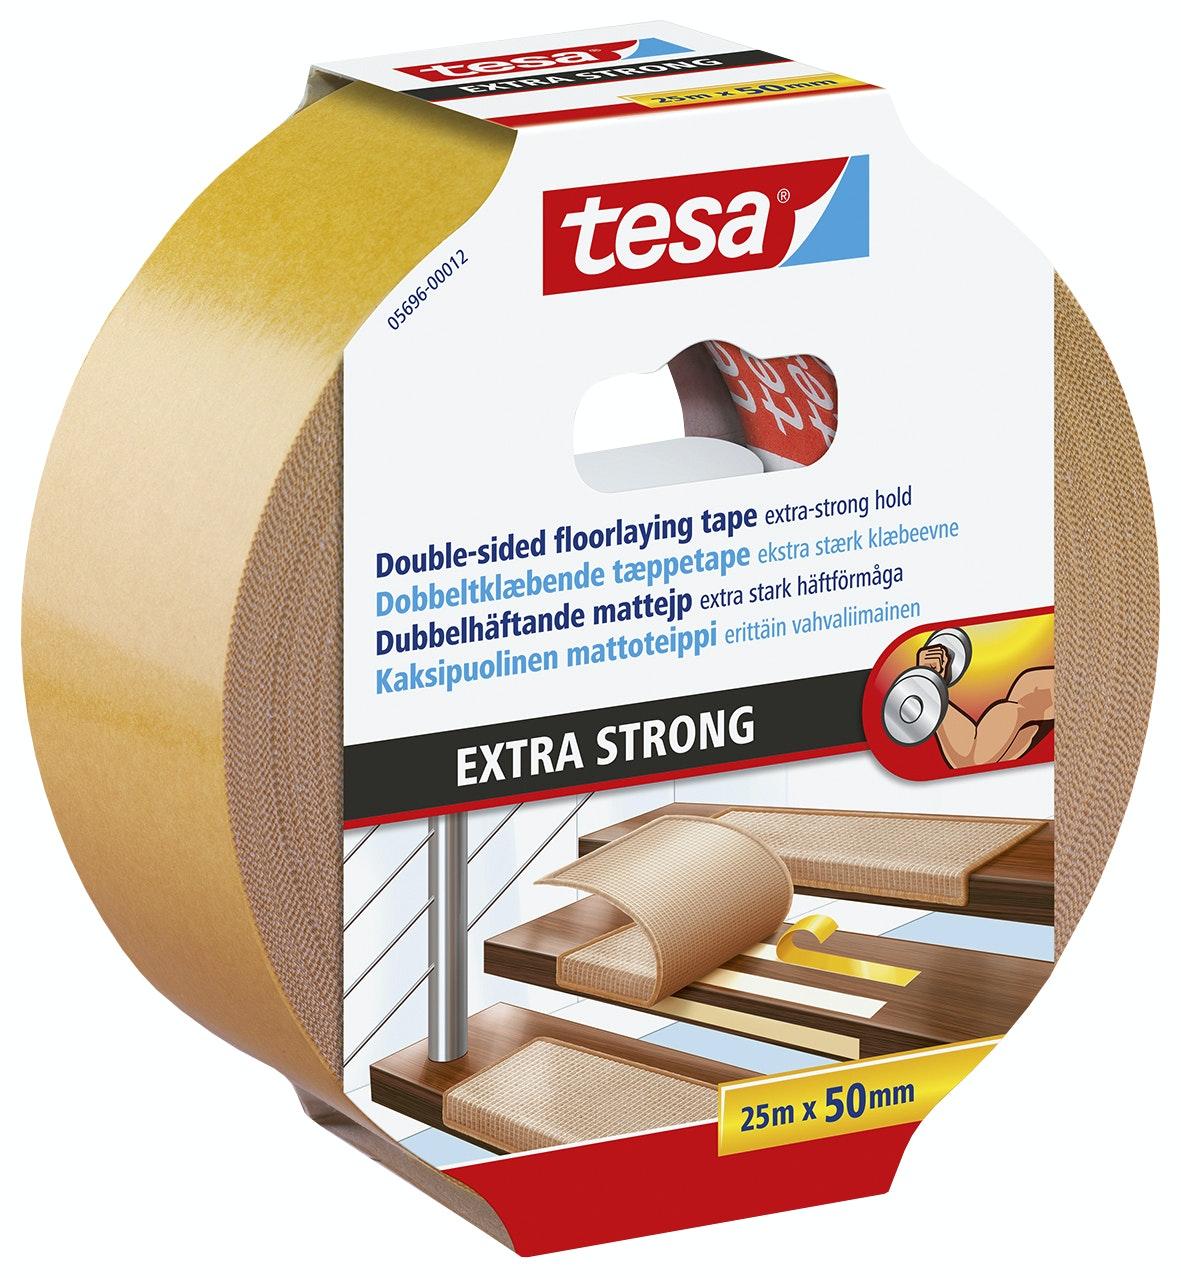 Mattejp Tesa Extra Stark 50mmX25m